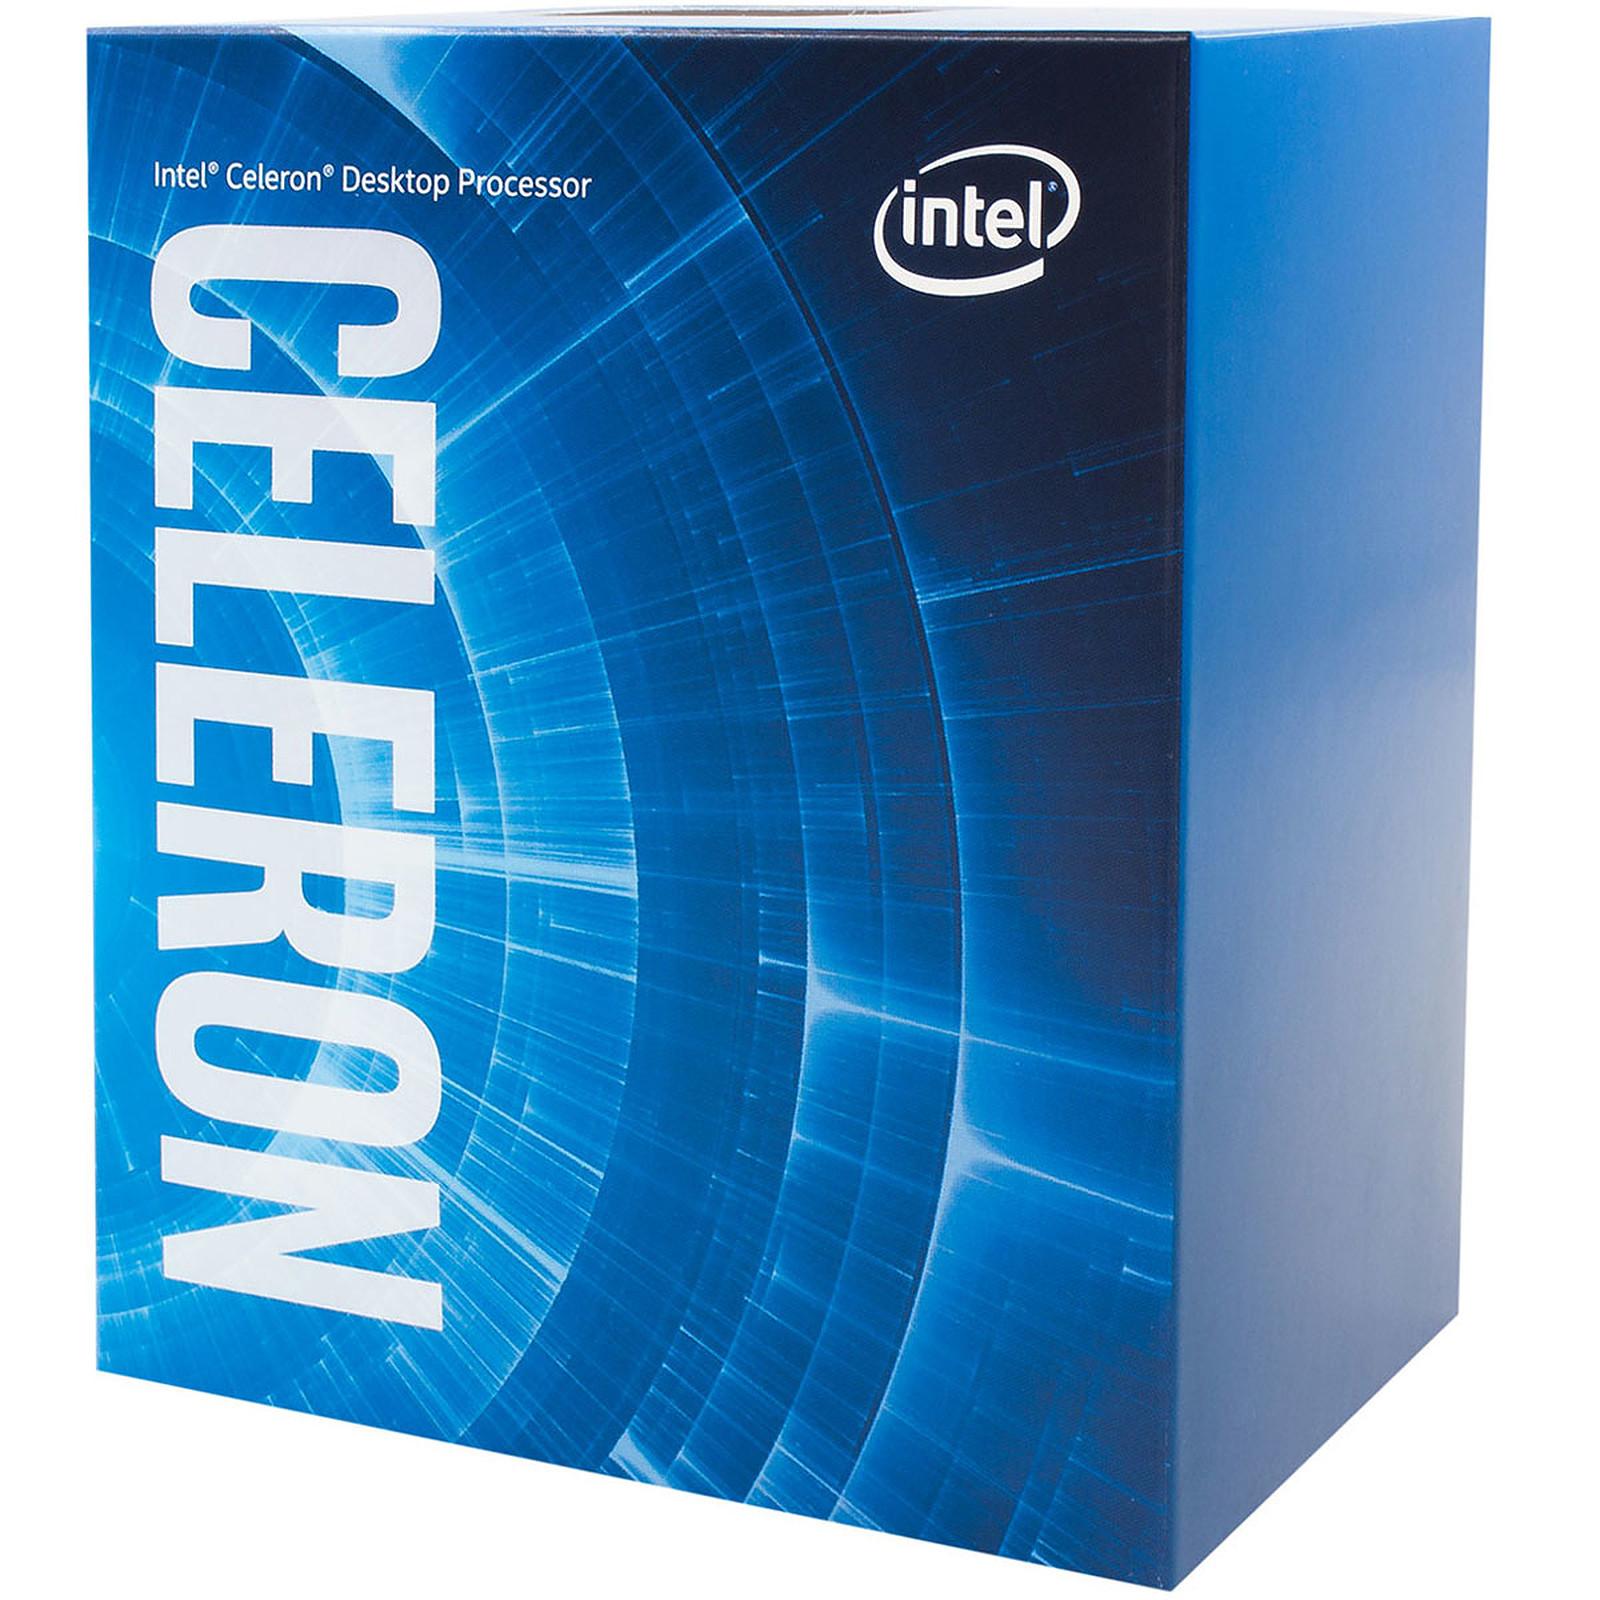 Microprocesador Intel Celeron G4930 2/2 3.20GHZ 2MB 1151